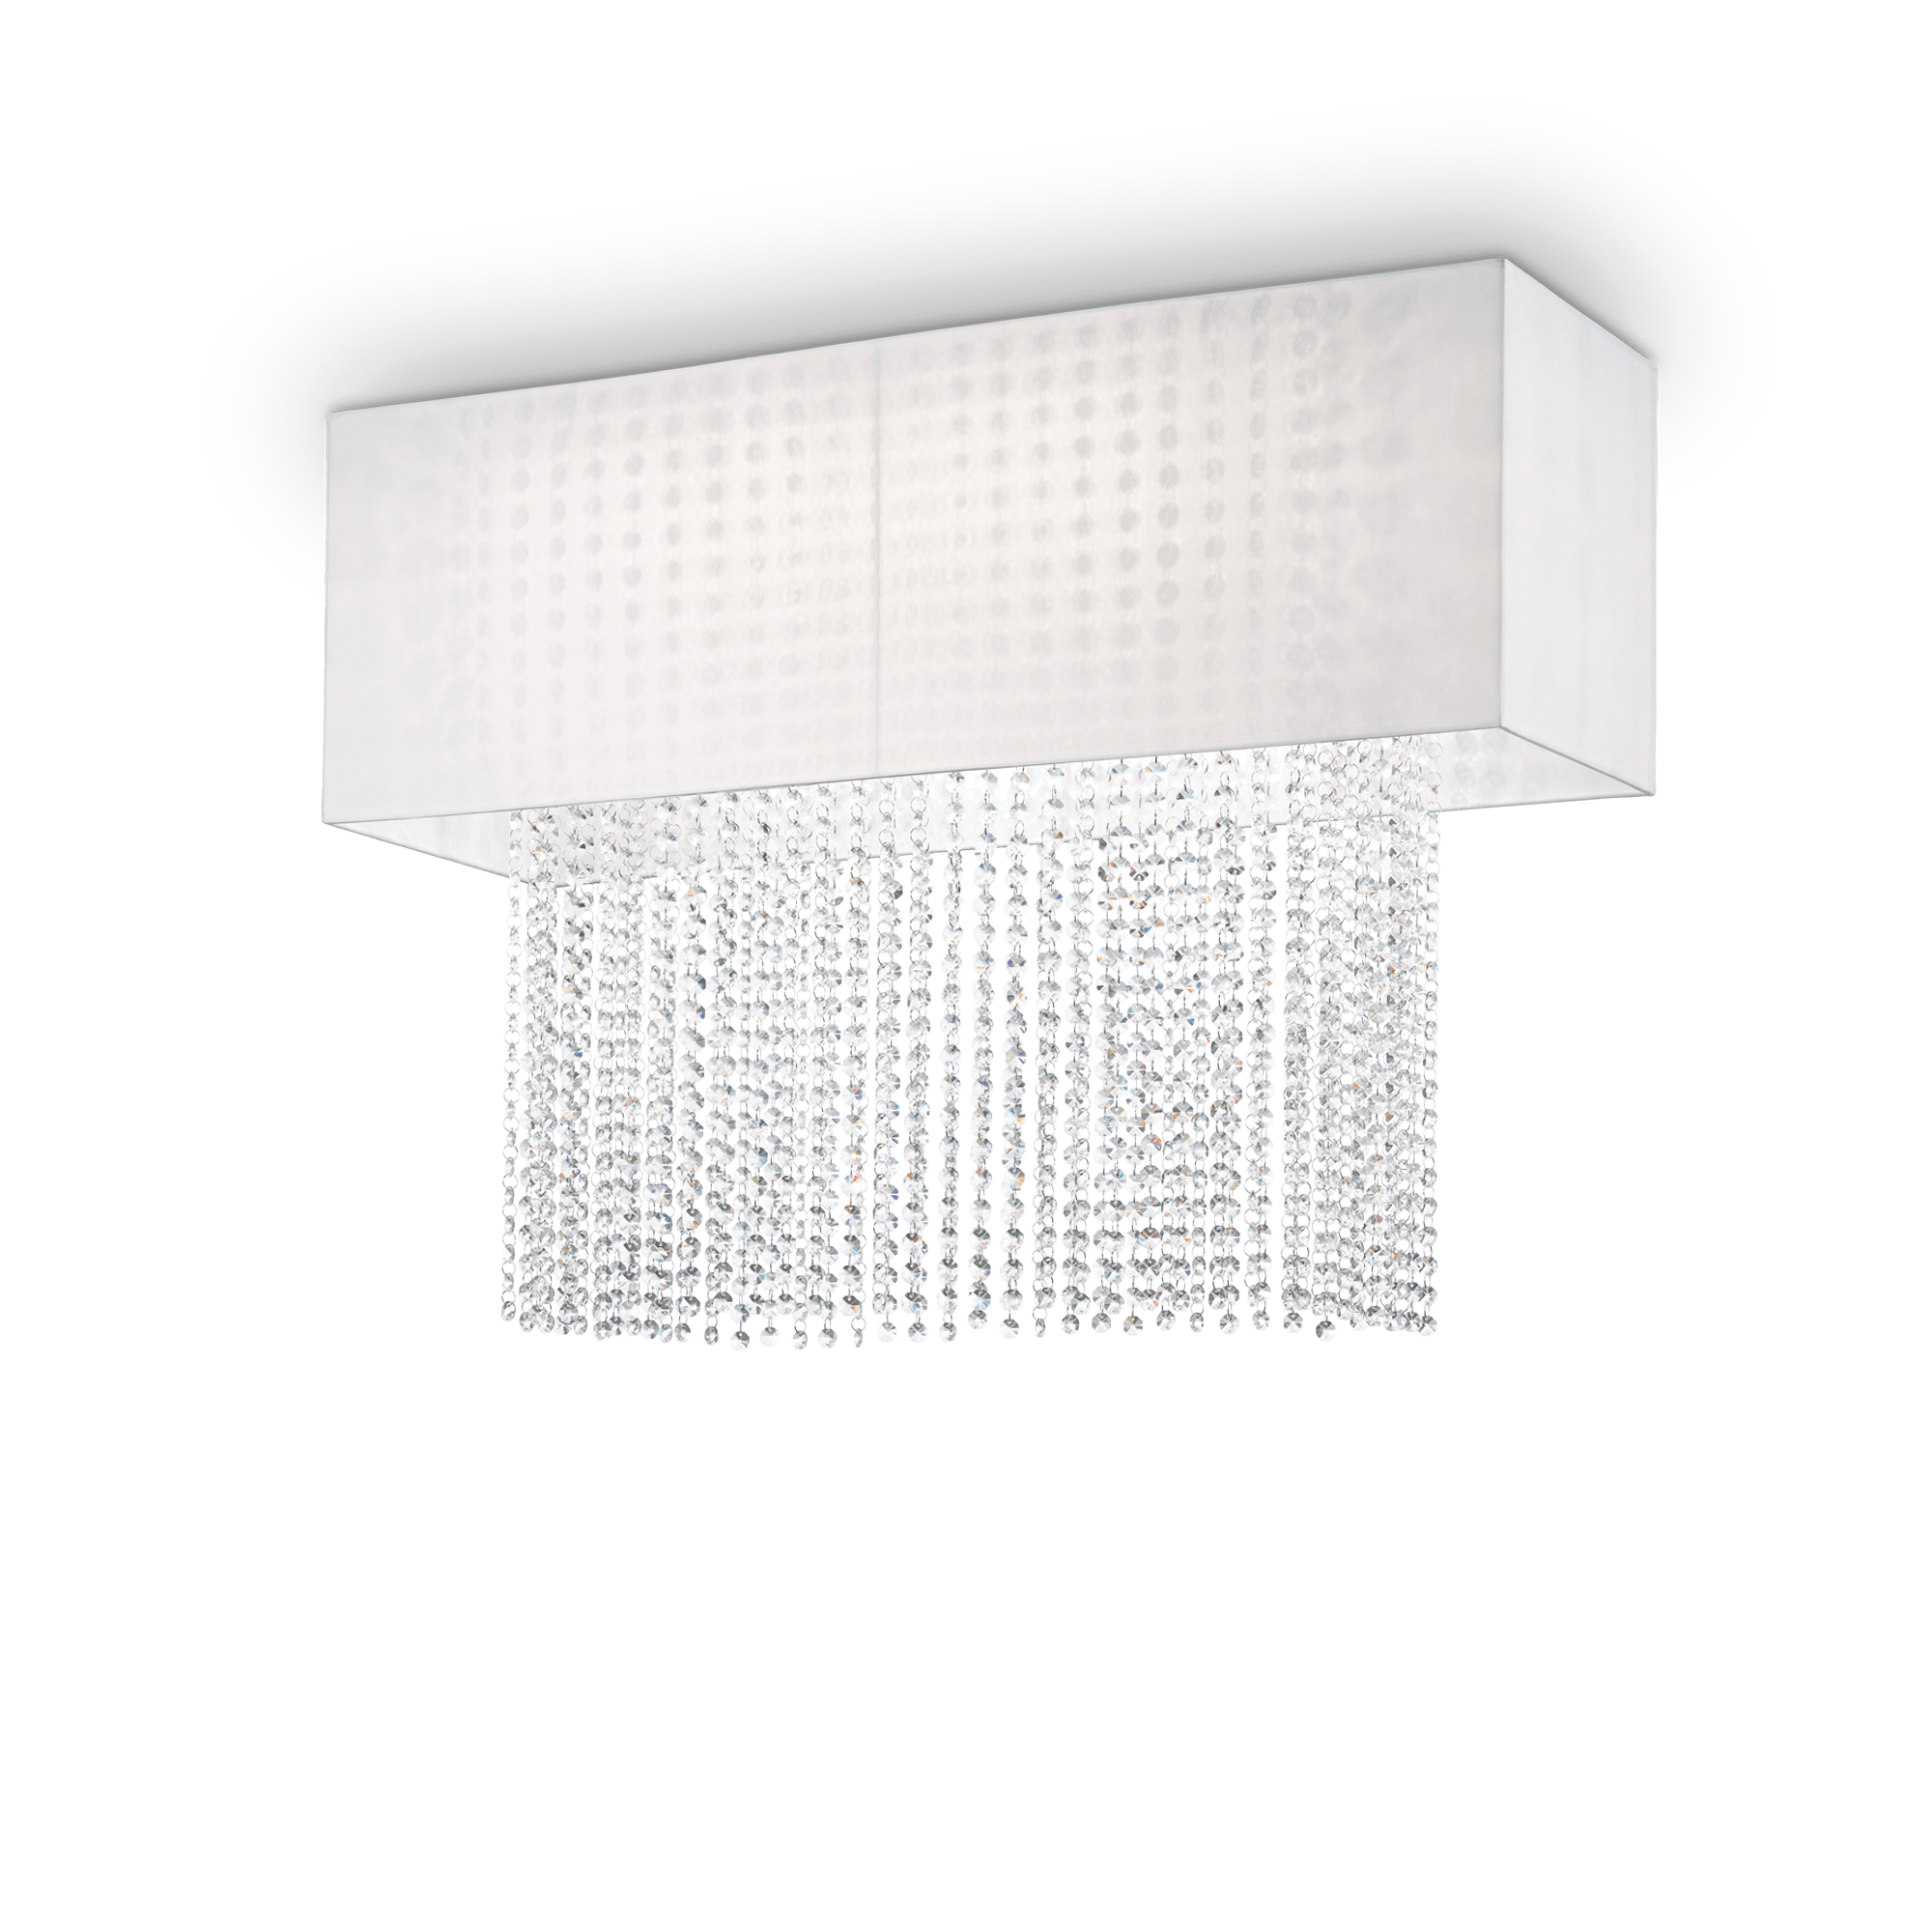 Потолочная люстра Ideal Lux PHOENIX PL5 BIANCO 099118 SALE, 5xE27x60W, хром, белый, прозрачный, металл, текстиль, хрусталь - фото 1